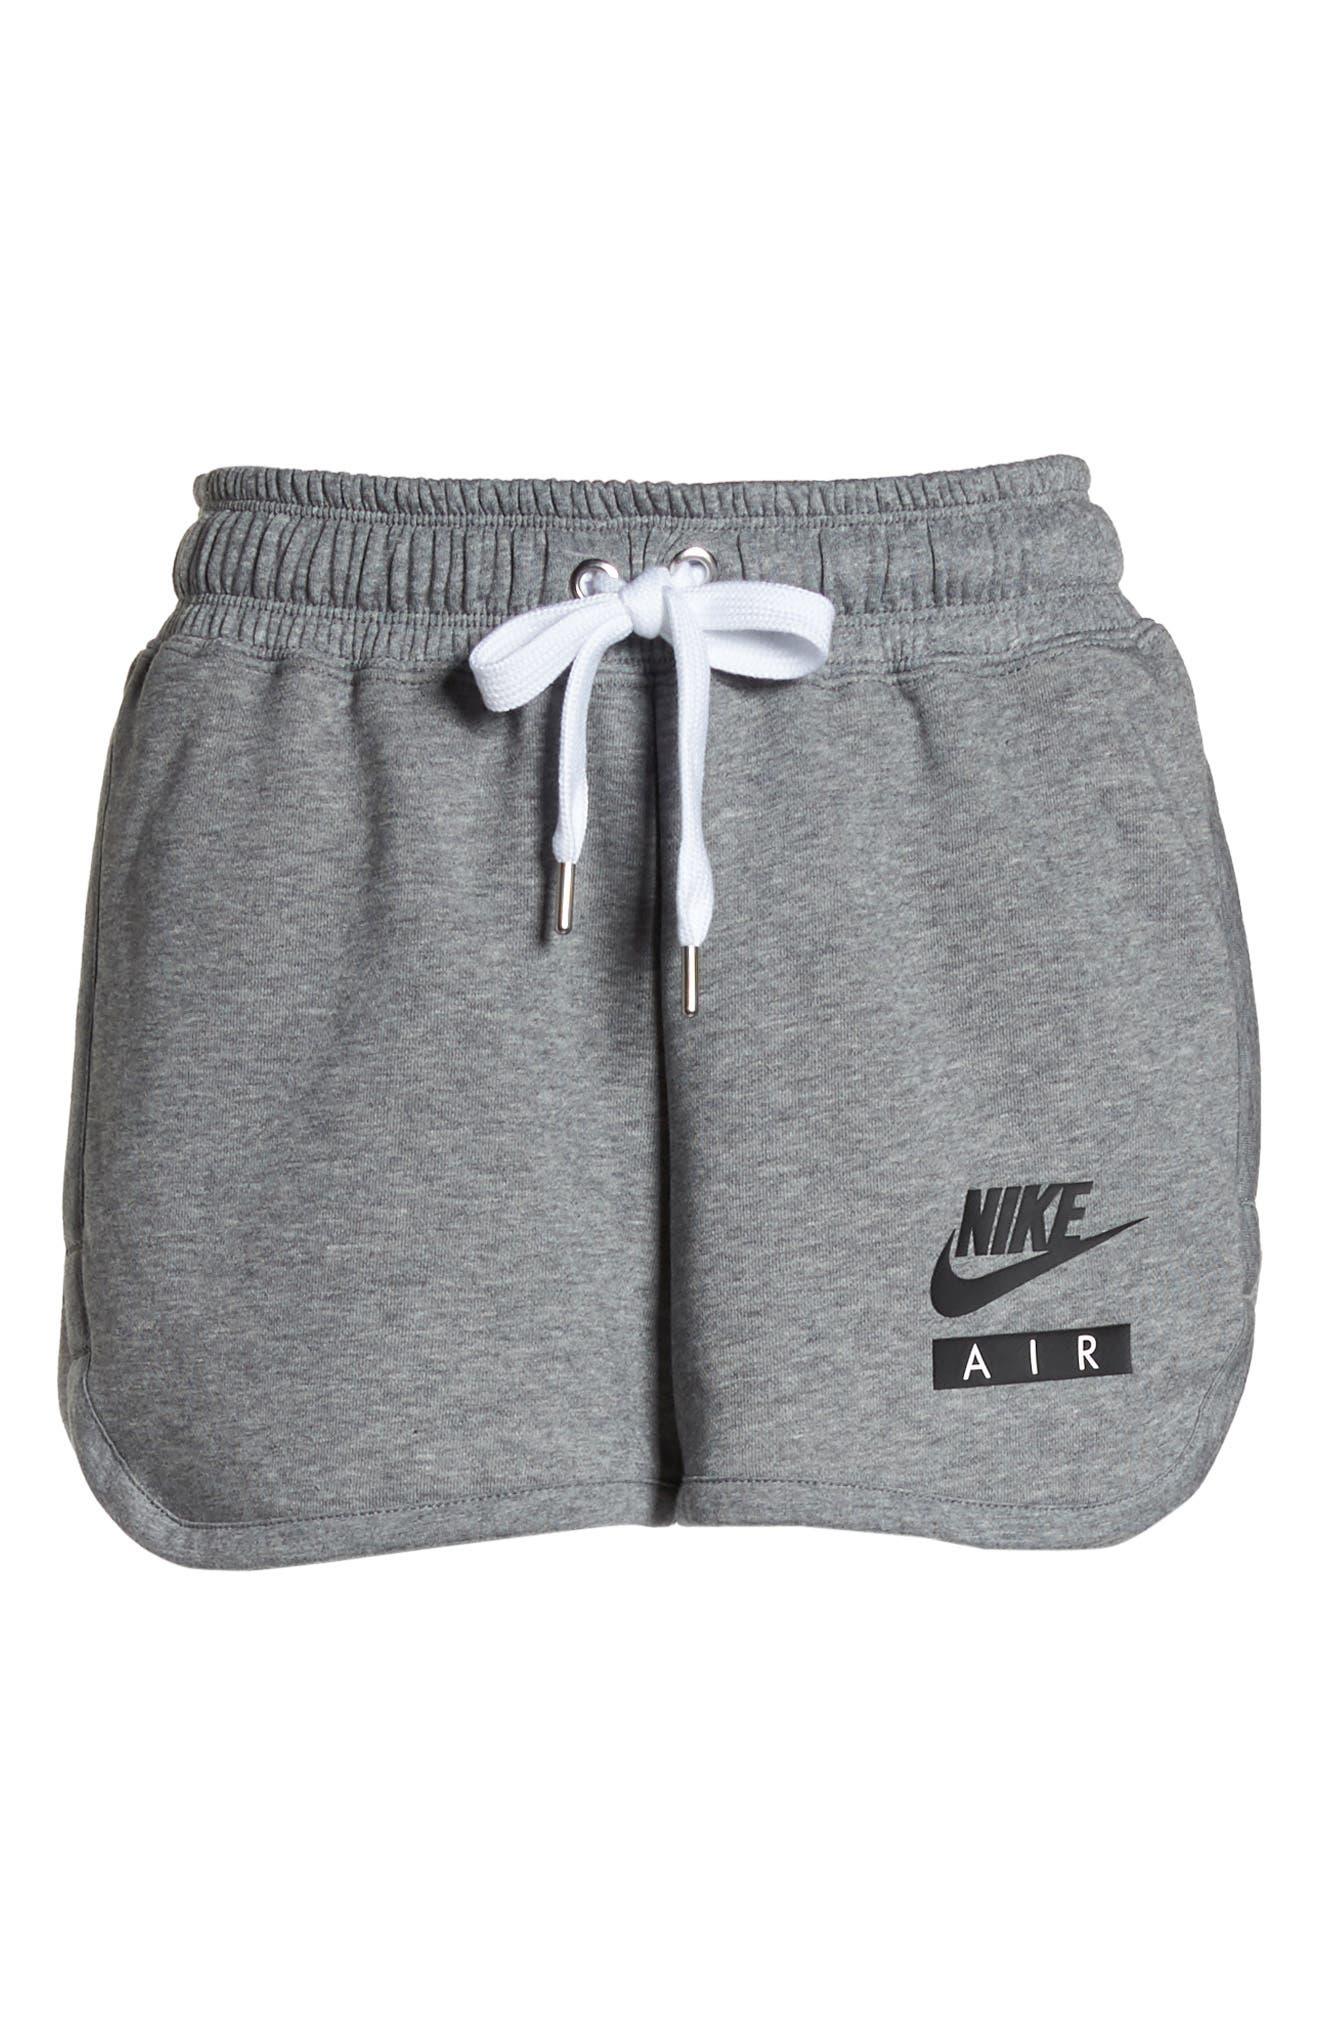 Sportswear Air Gym Shorts,                             Alternate thumbnail 8, color,                             Carbon Heather/ White/ Black